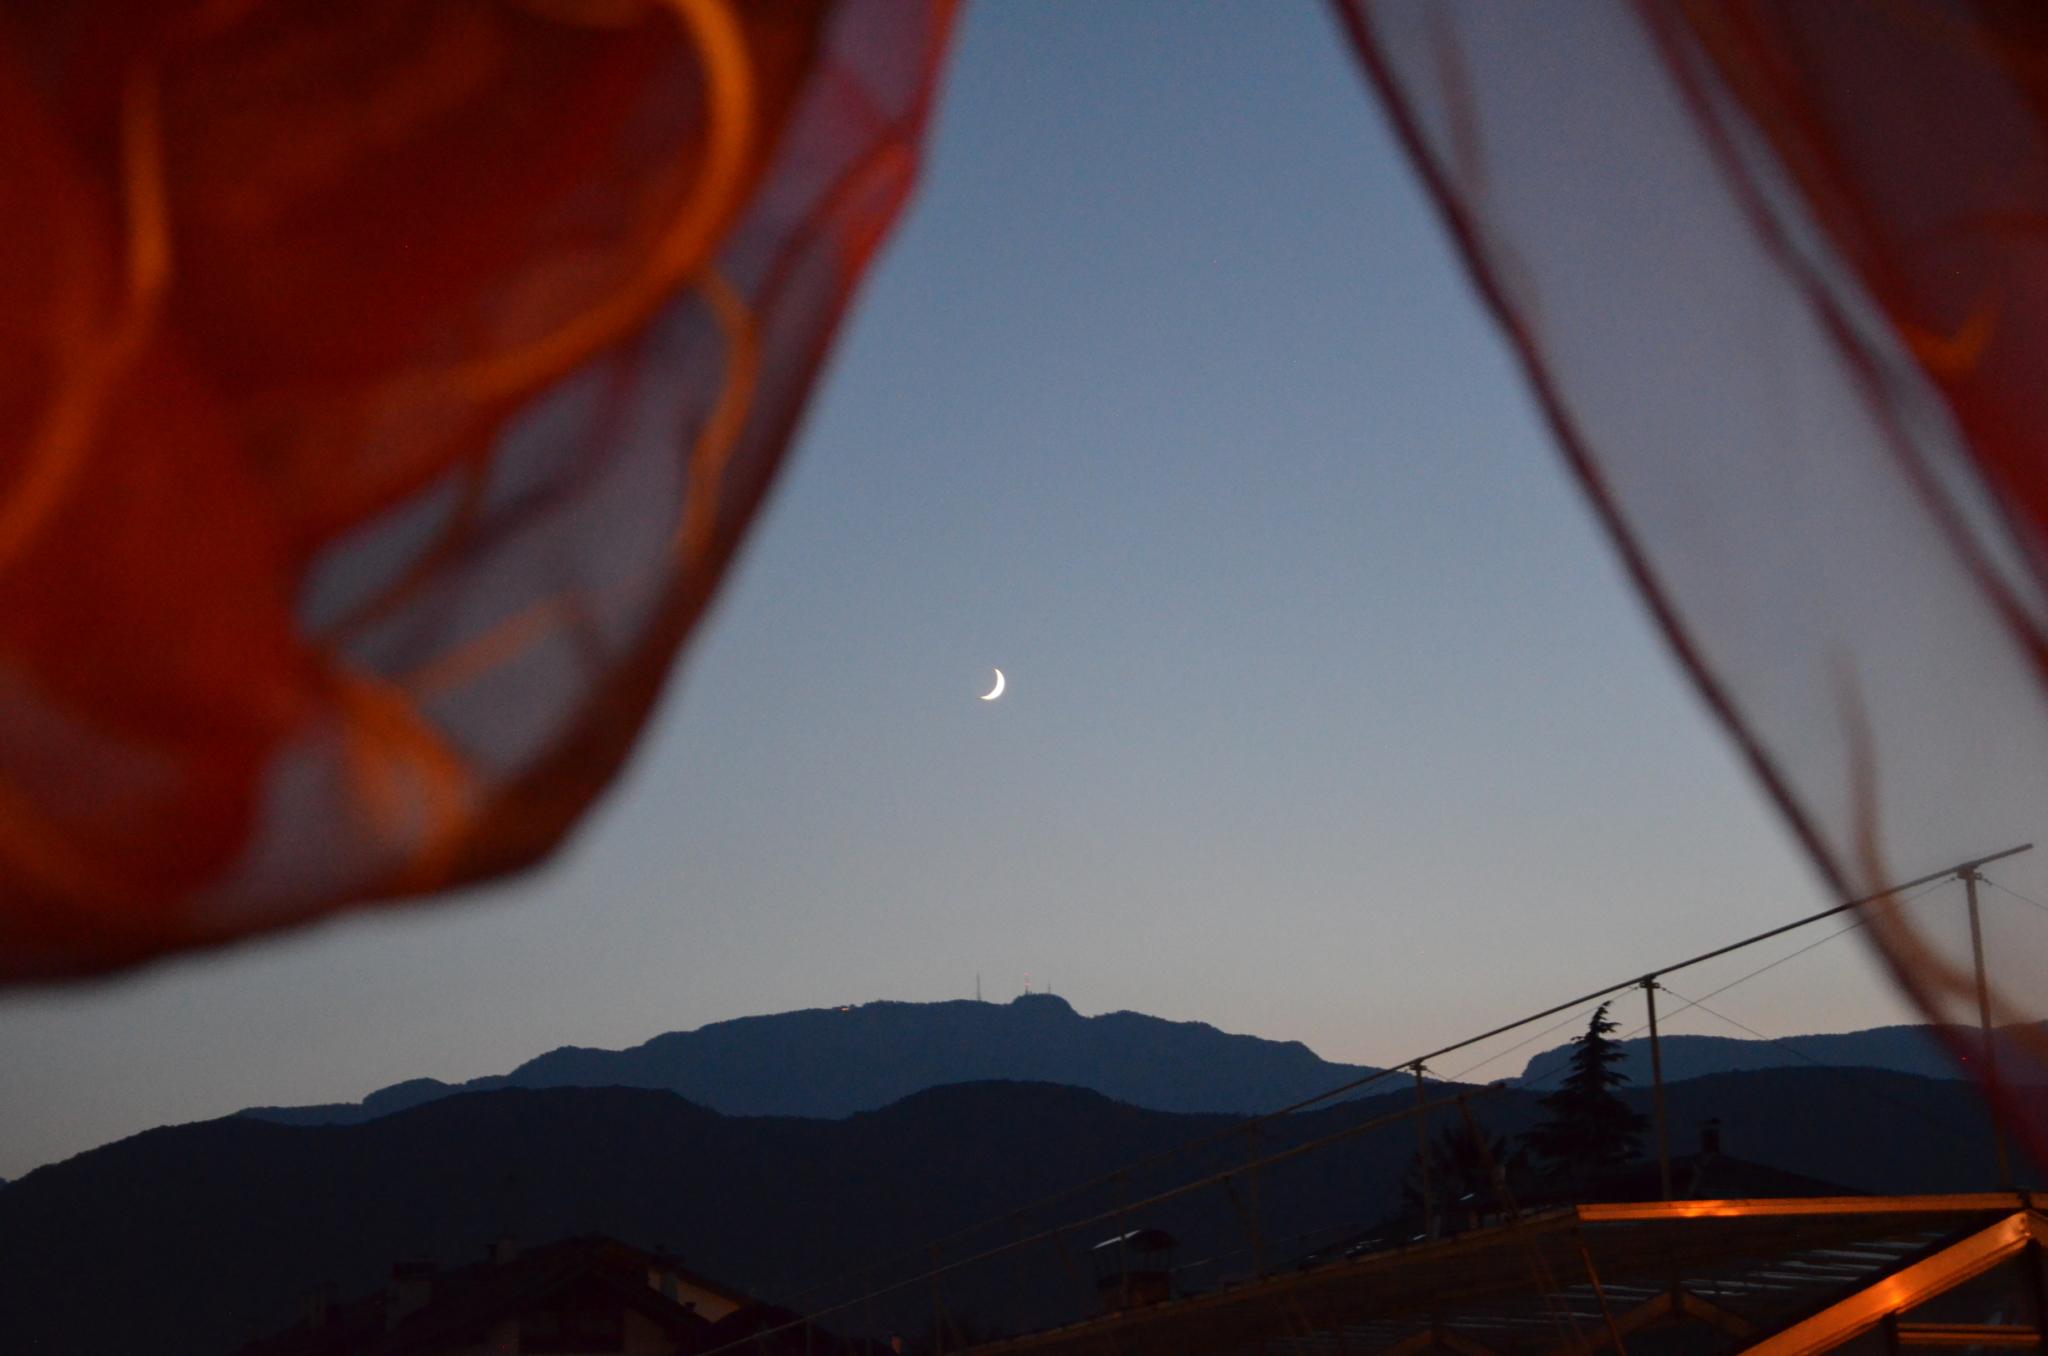 Amar - The Moon